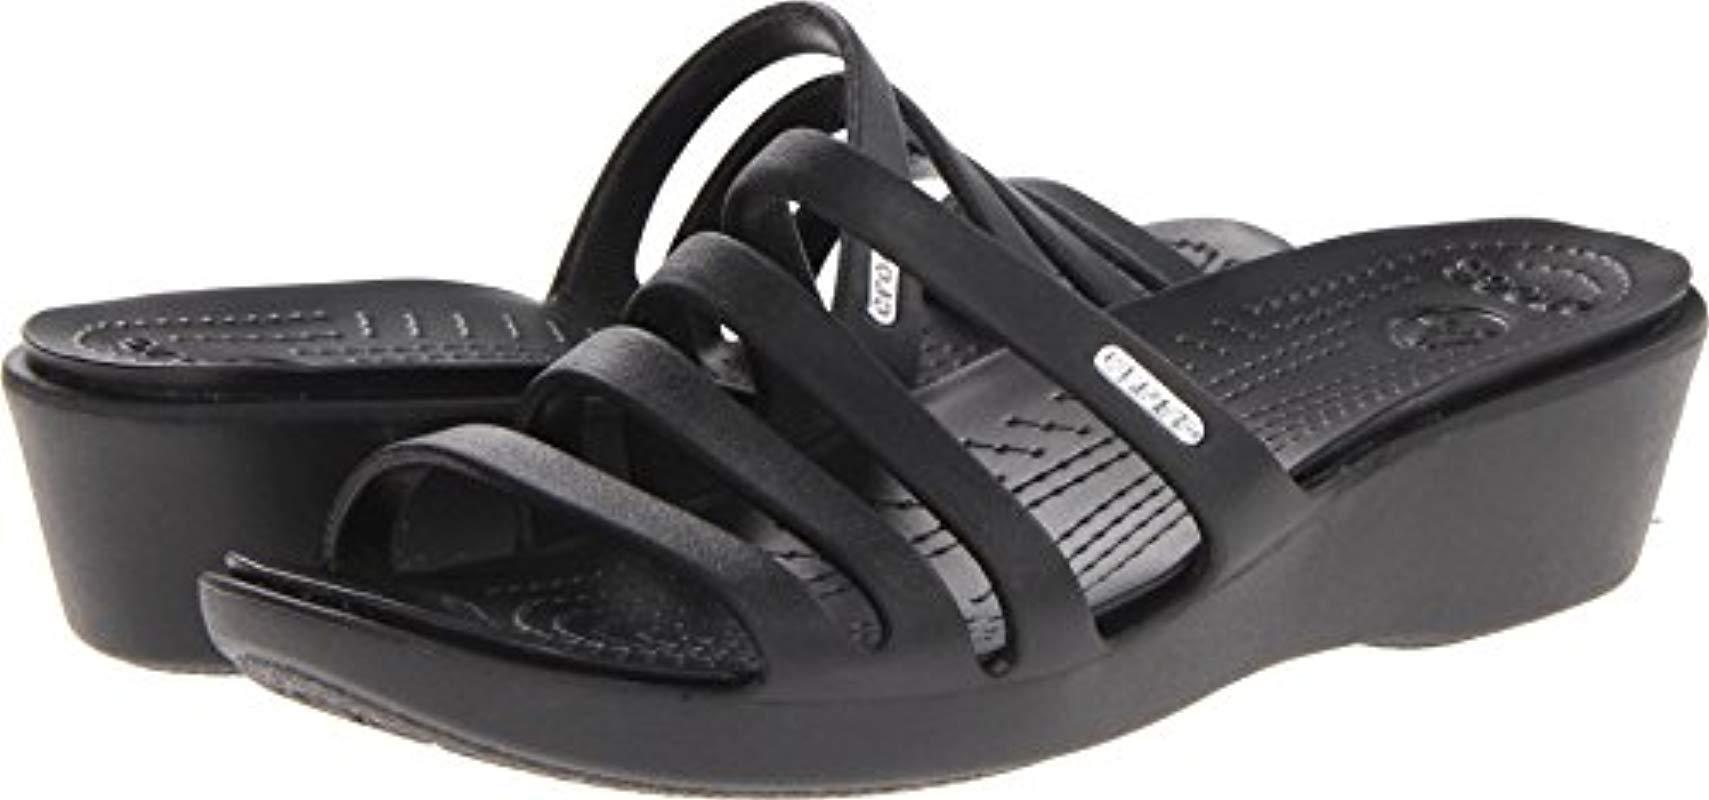 090db87c7f4 Lyst - Crocs™ Rhonda Wedge Pump in Black - Save 13%